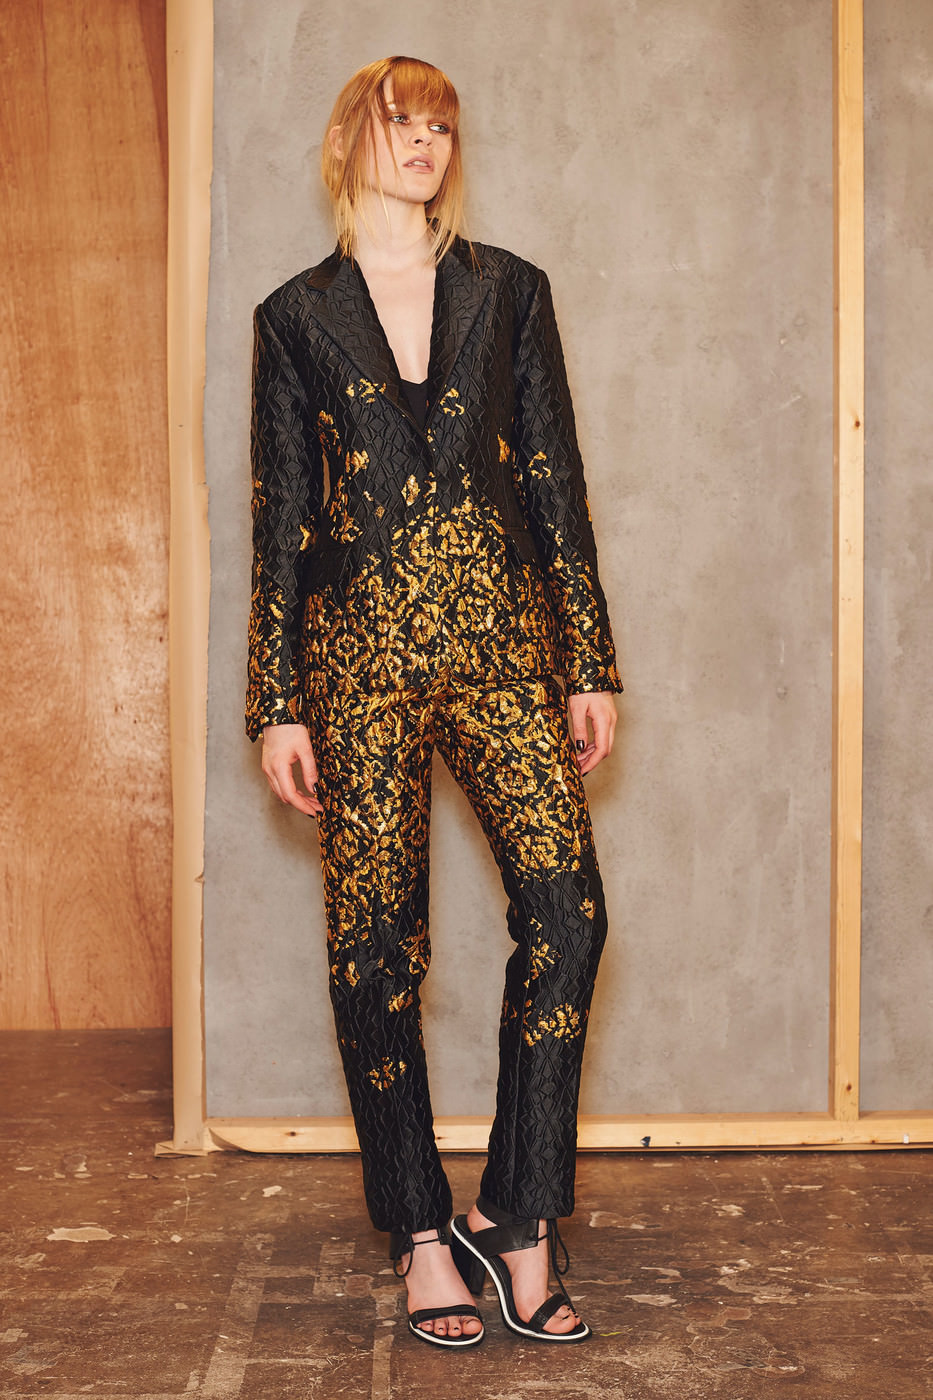 Мода 2018 костюмы женские фото